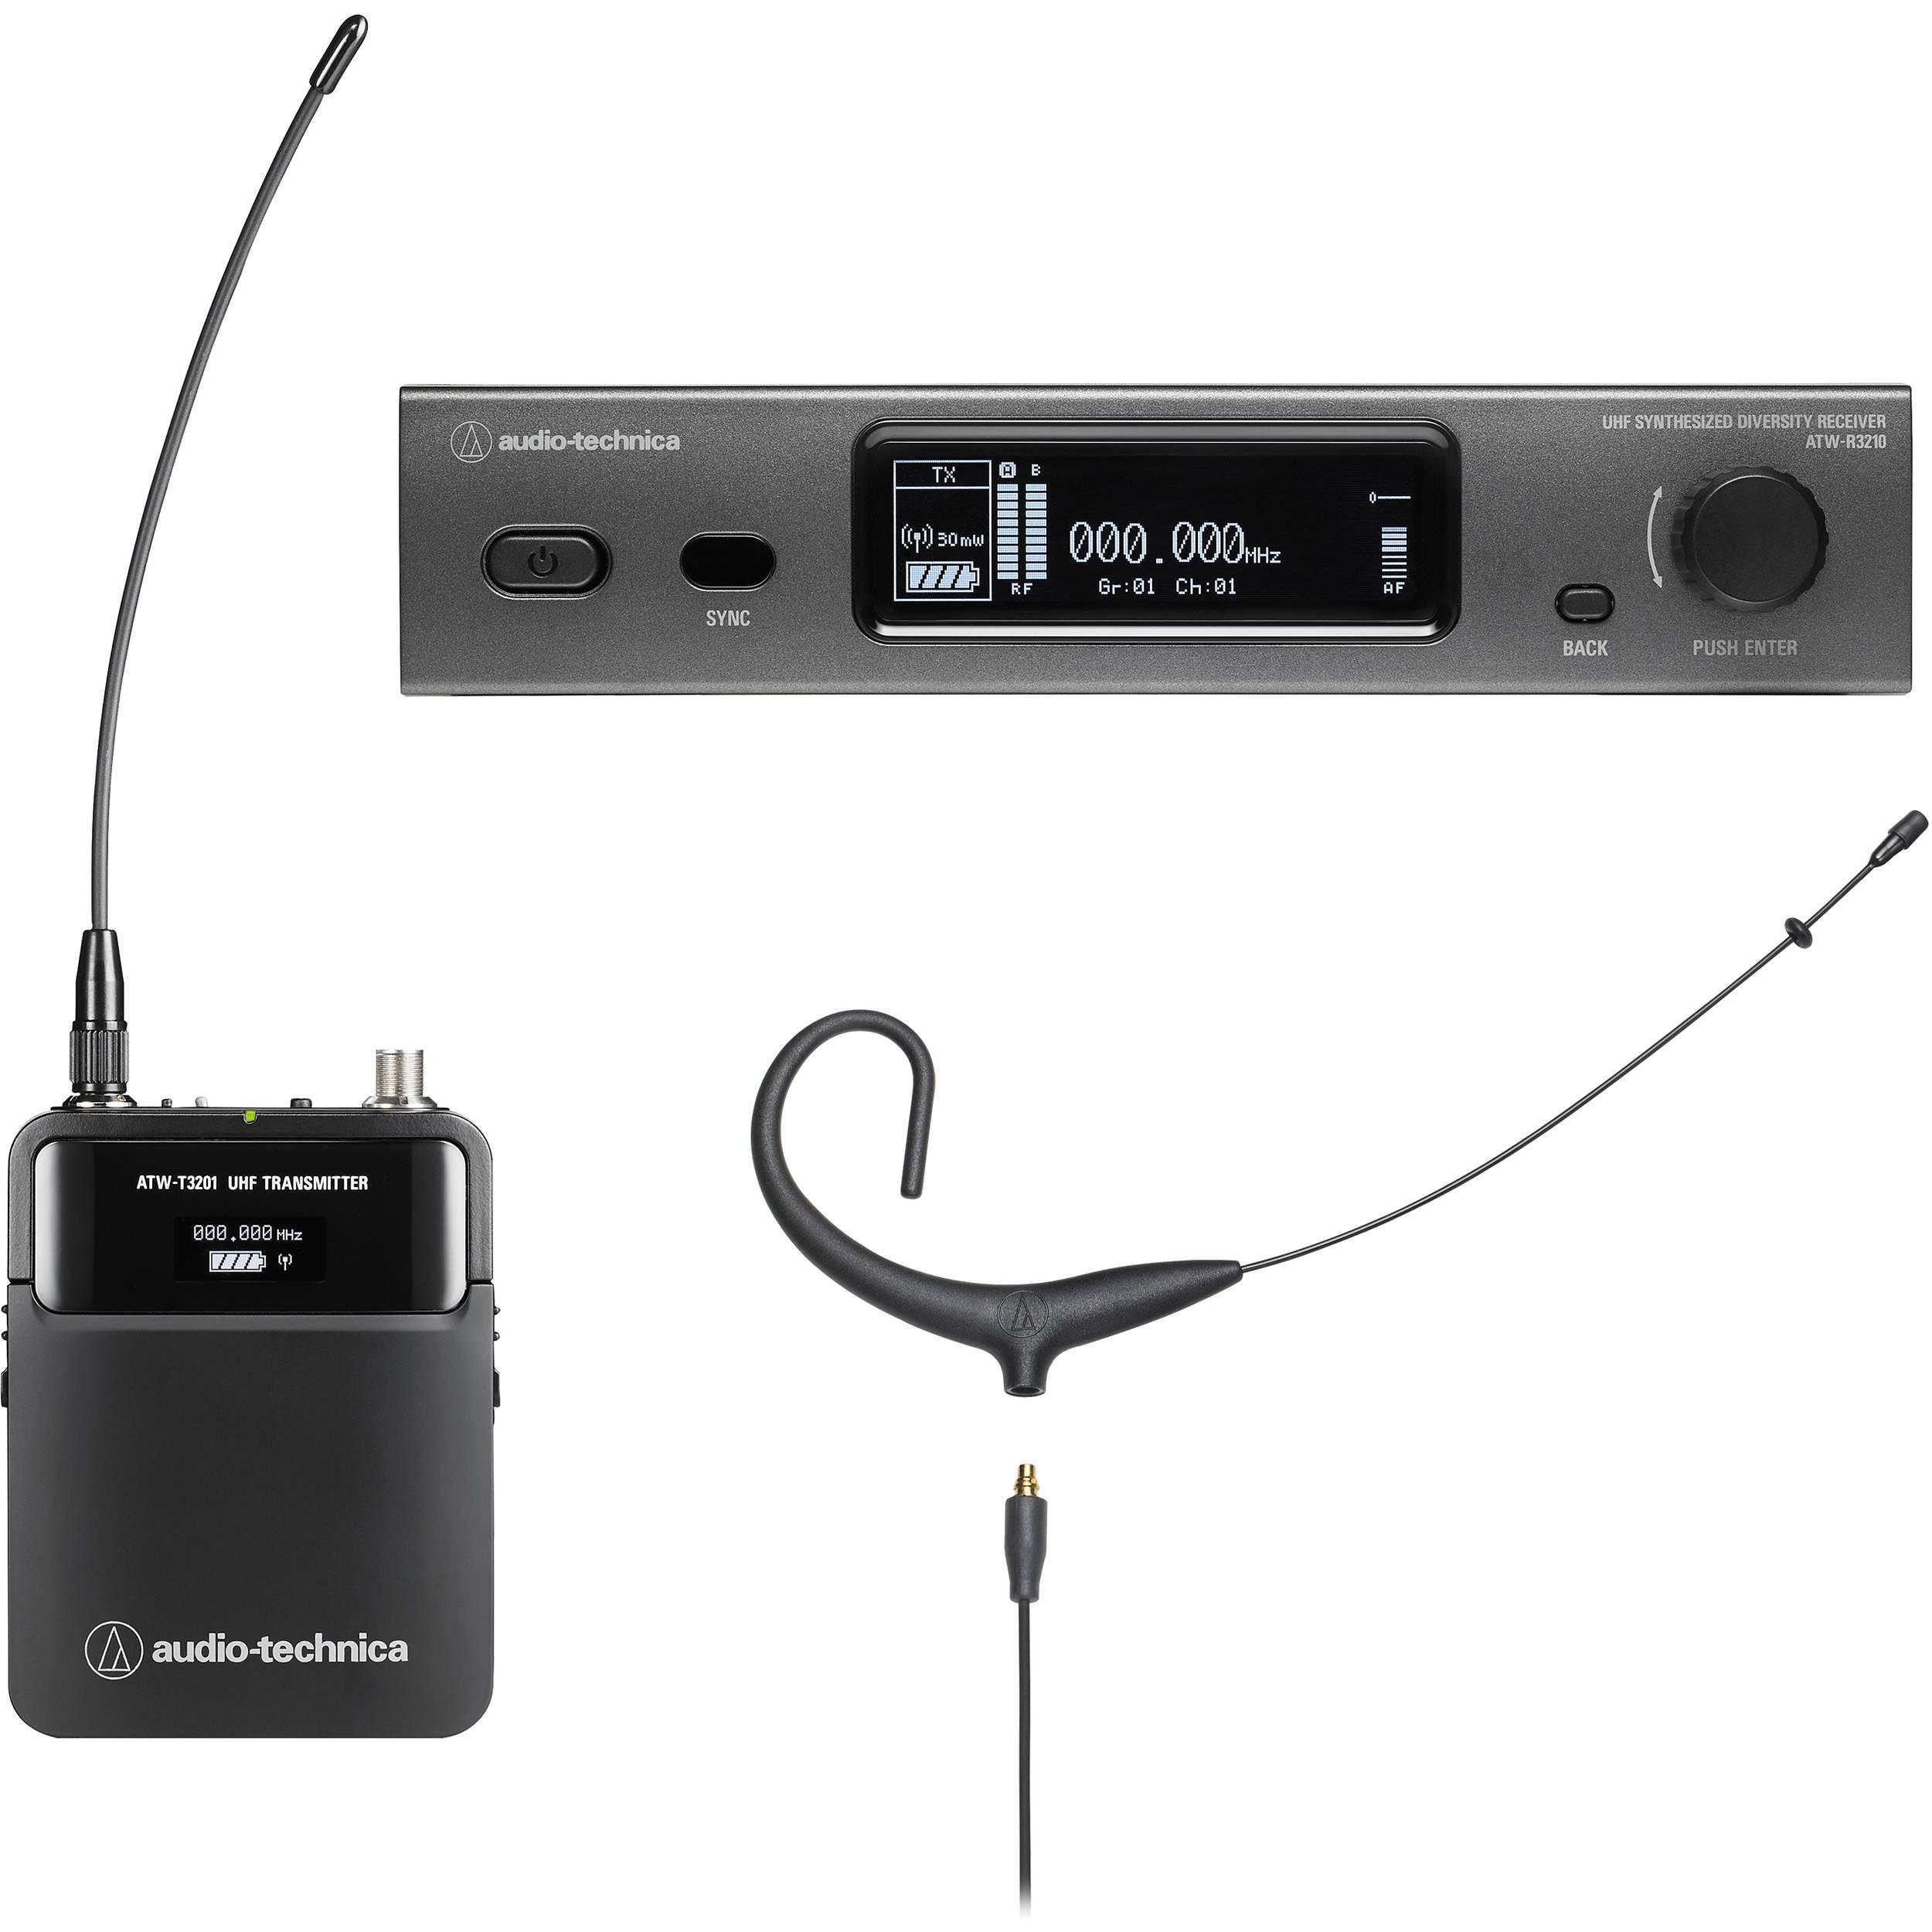 Aluminum Heat Sink 80mm x 138mm x 40mm for DIY Audio Power Amplifier Project